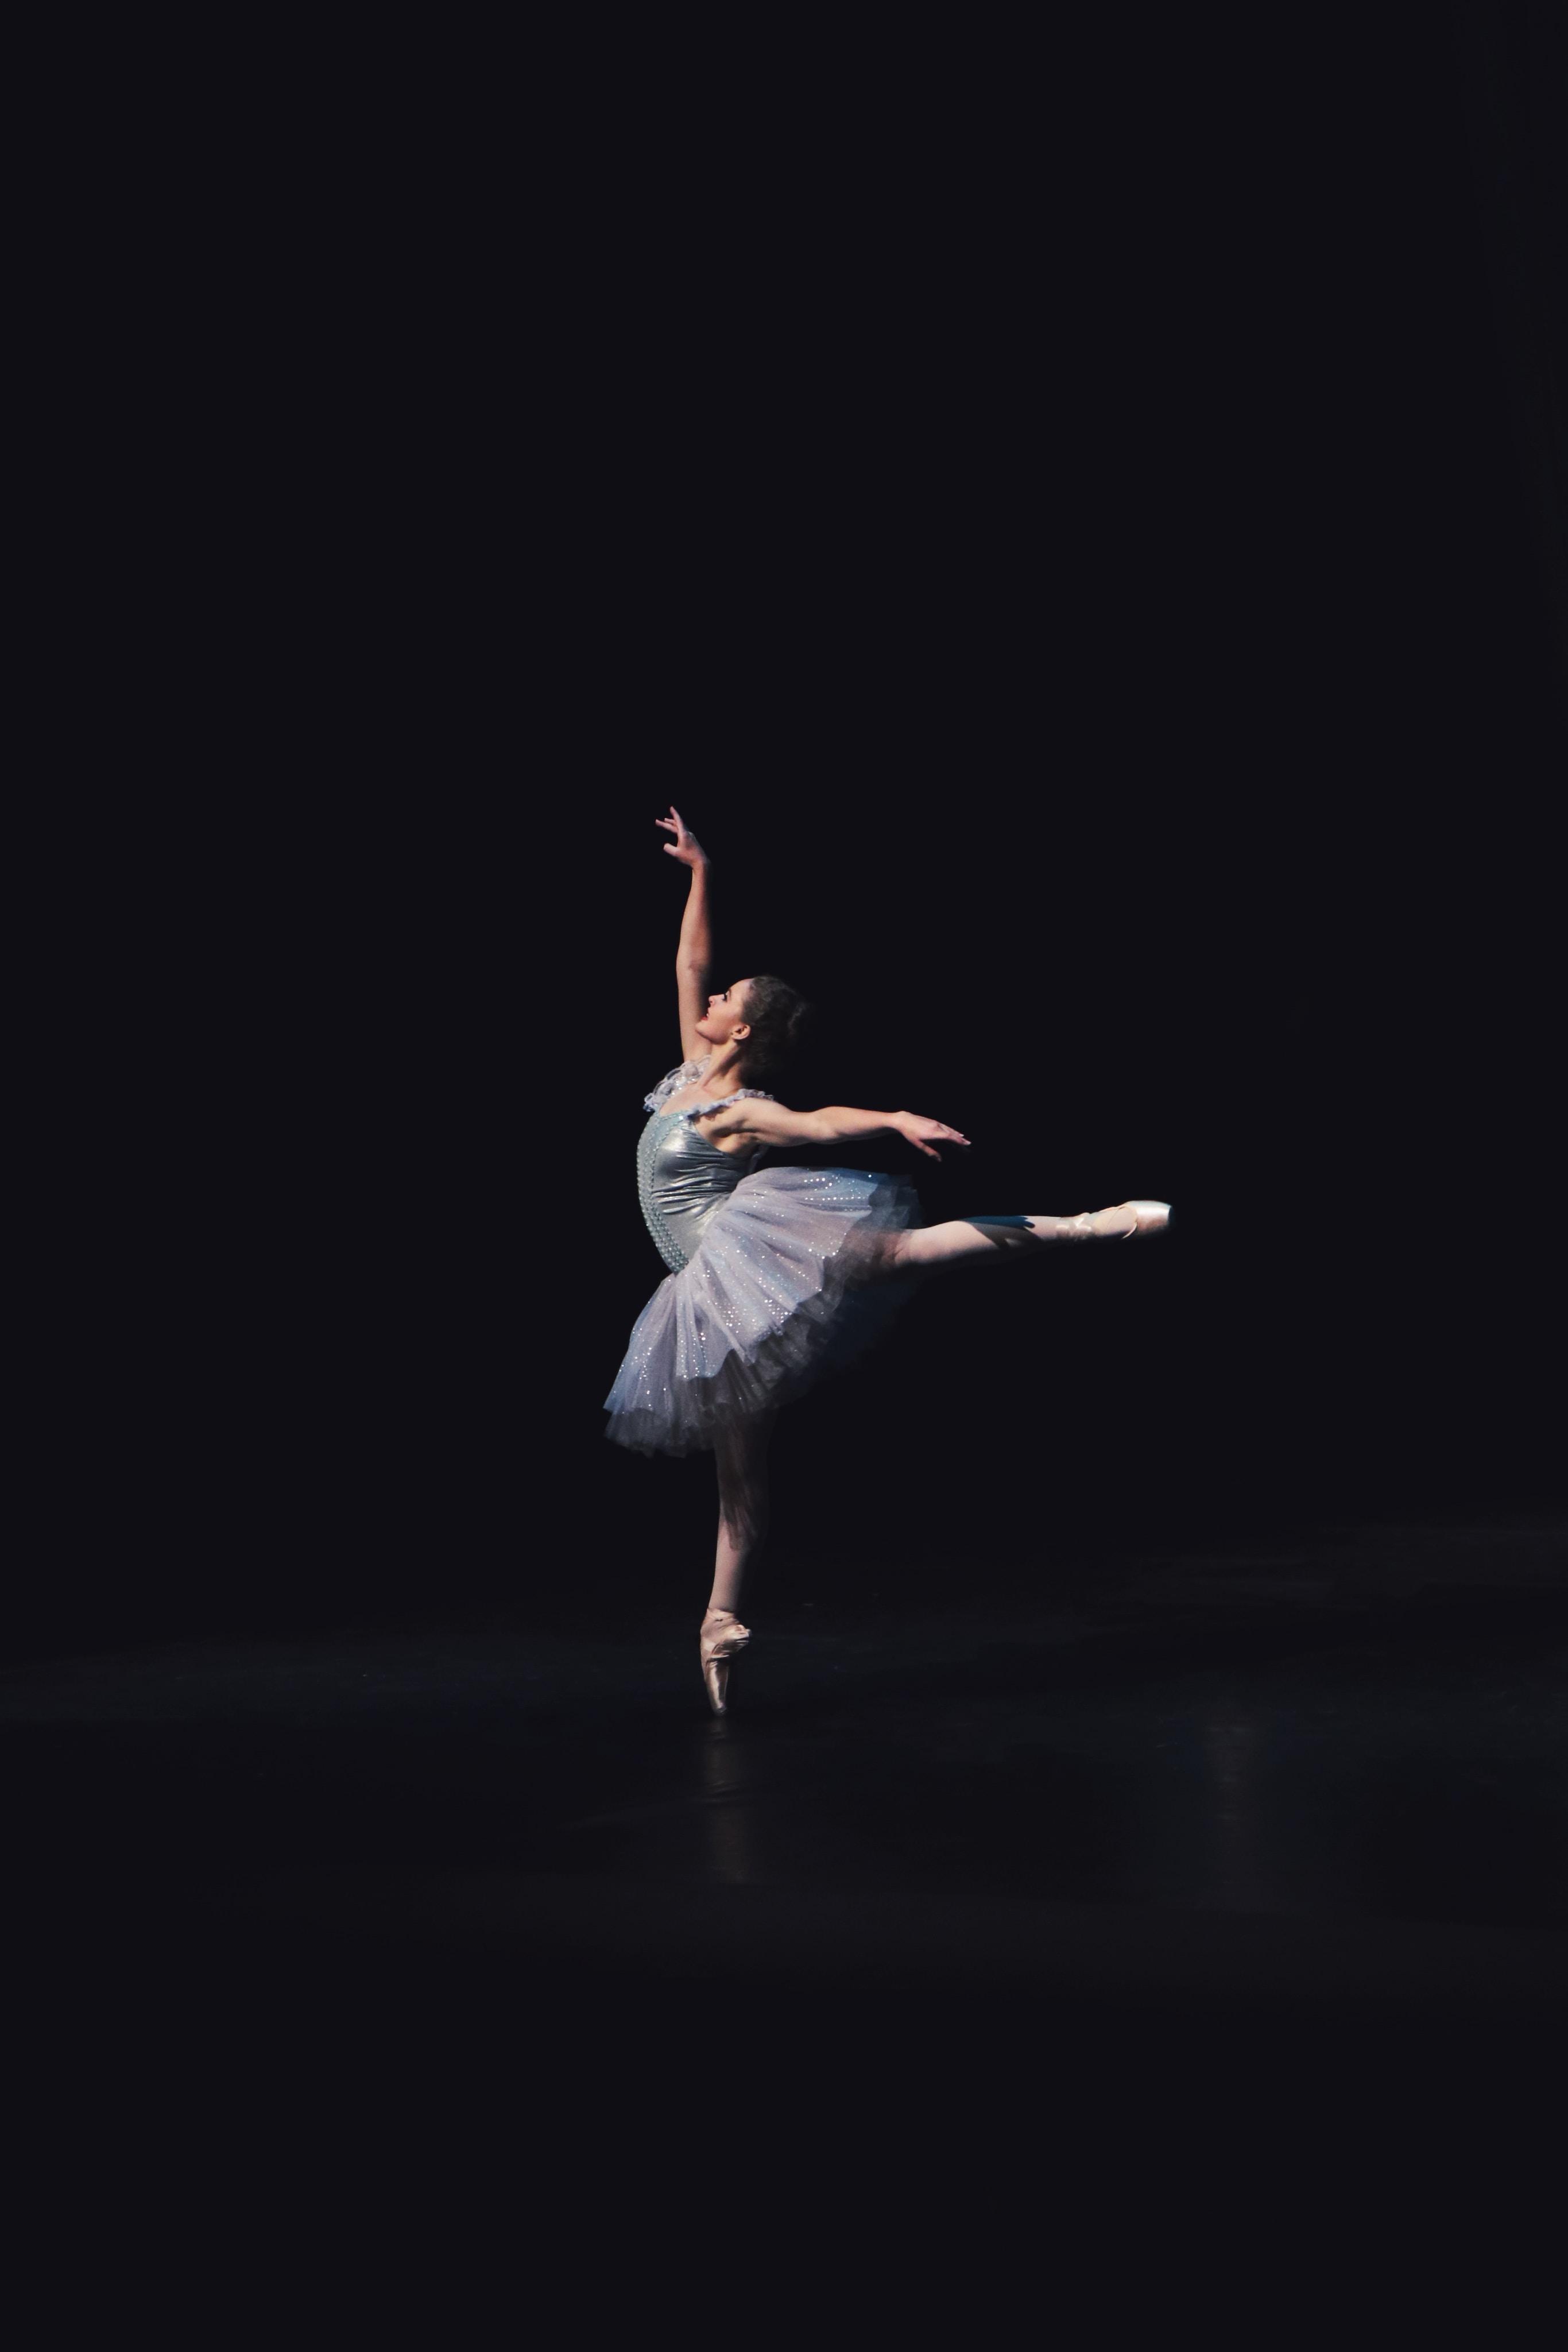 Ballet dancer performing in rehearsal executing graceful pose in dark room